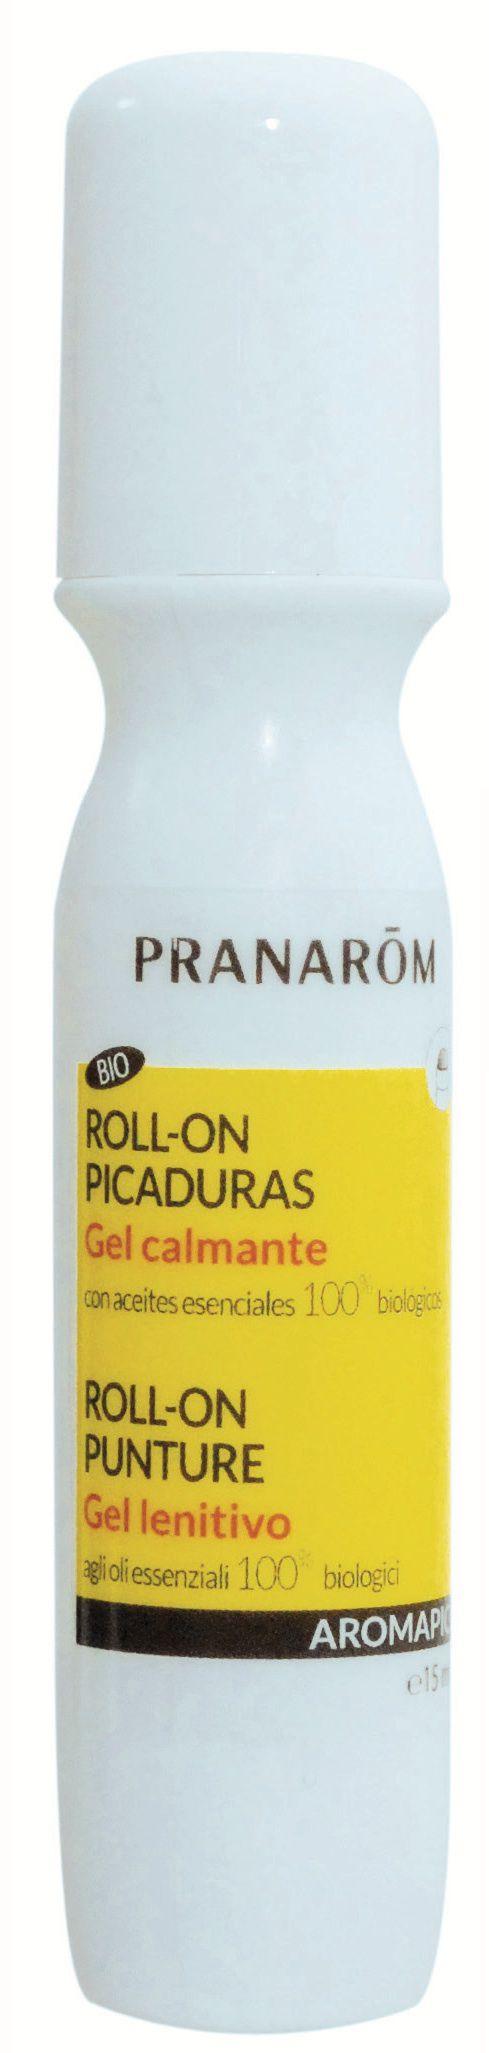 pranarom_aromapic_rollon_calmante.jpg